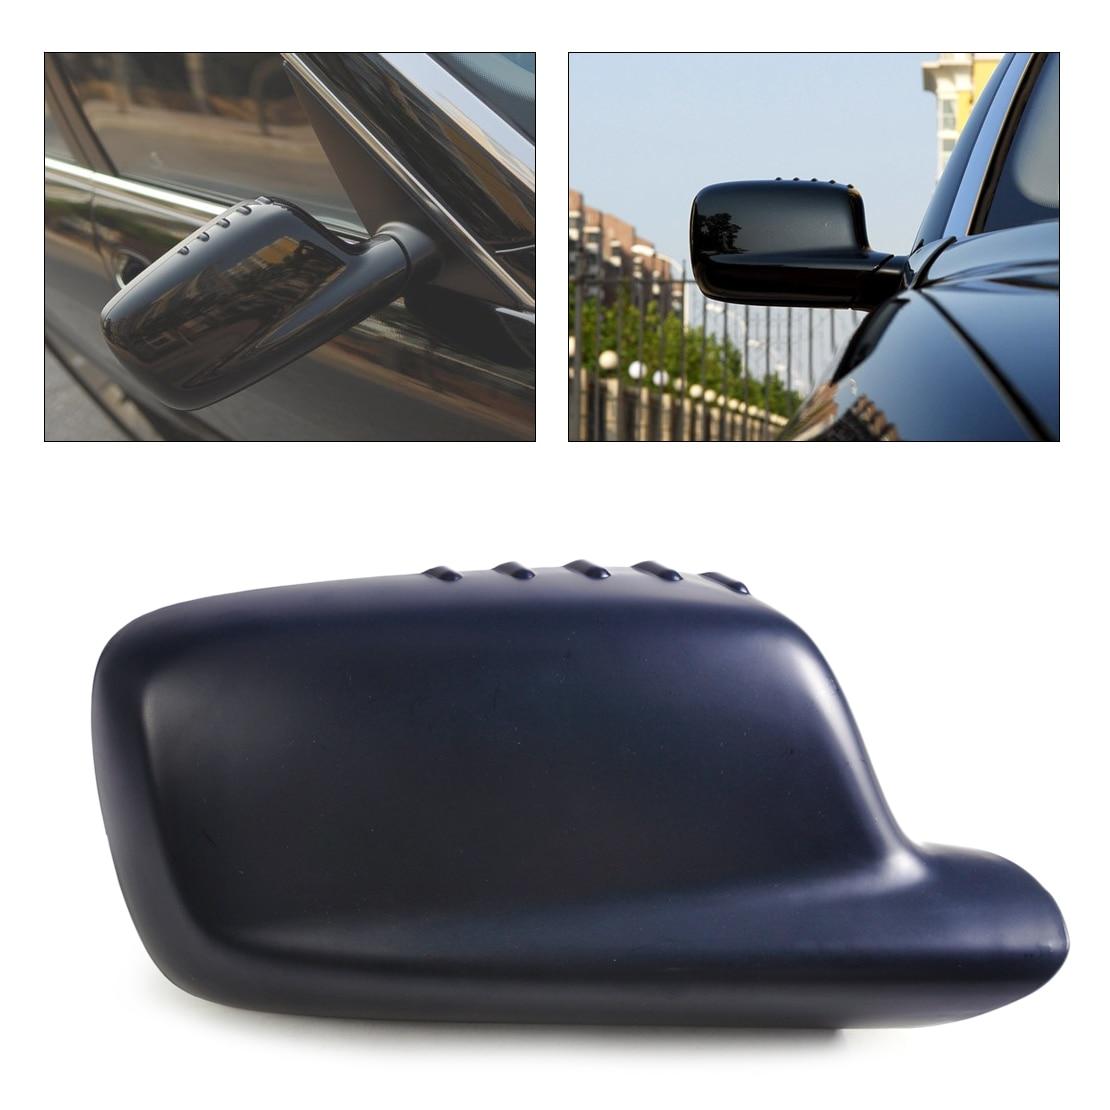 NEW 07-14 GM OEM RIGHT RH SIDE DOOR MIRROR GLASS AUTO DIM HEAT ARABIC WRITING